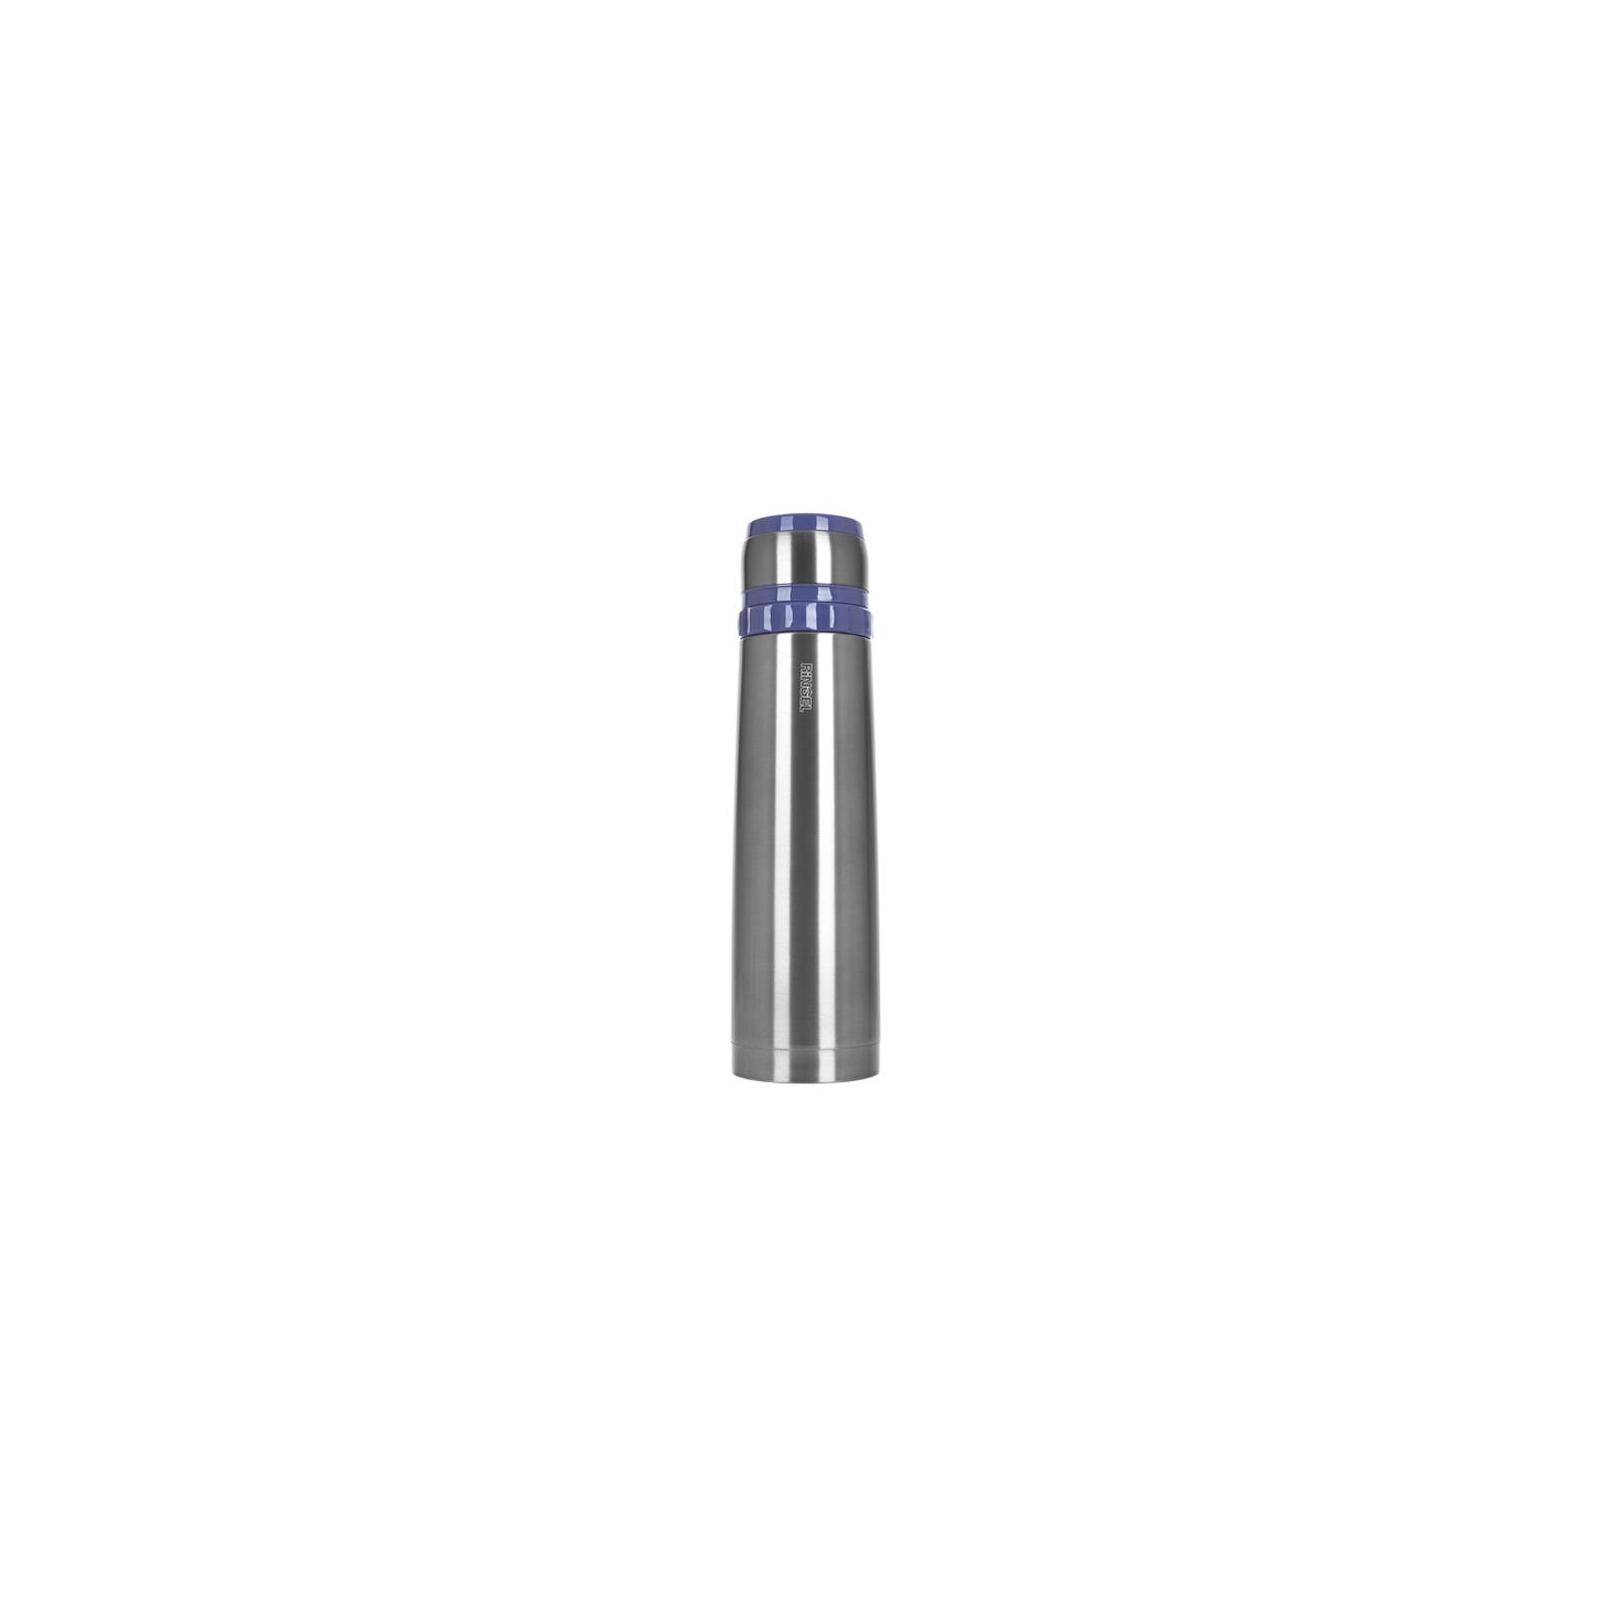 Термос Ringel Solo 0.8 L Black (RG-6101-800/2)